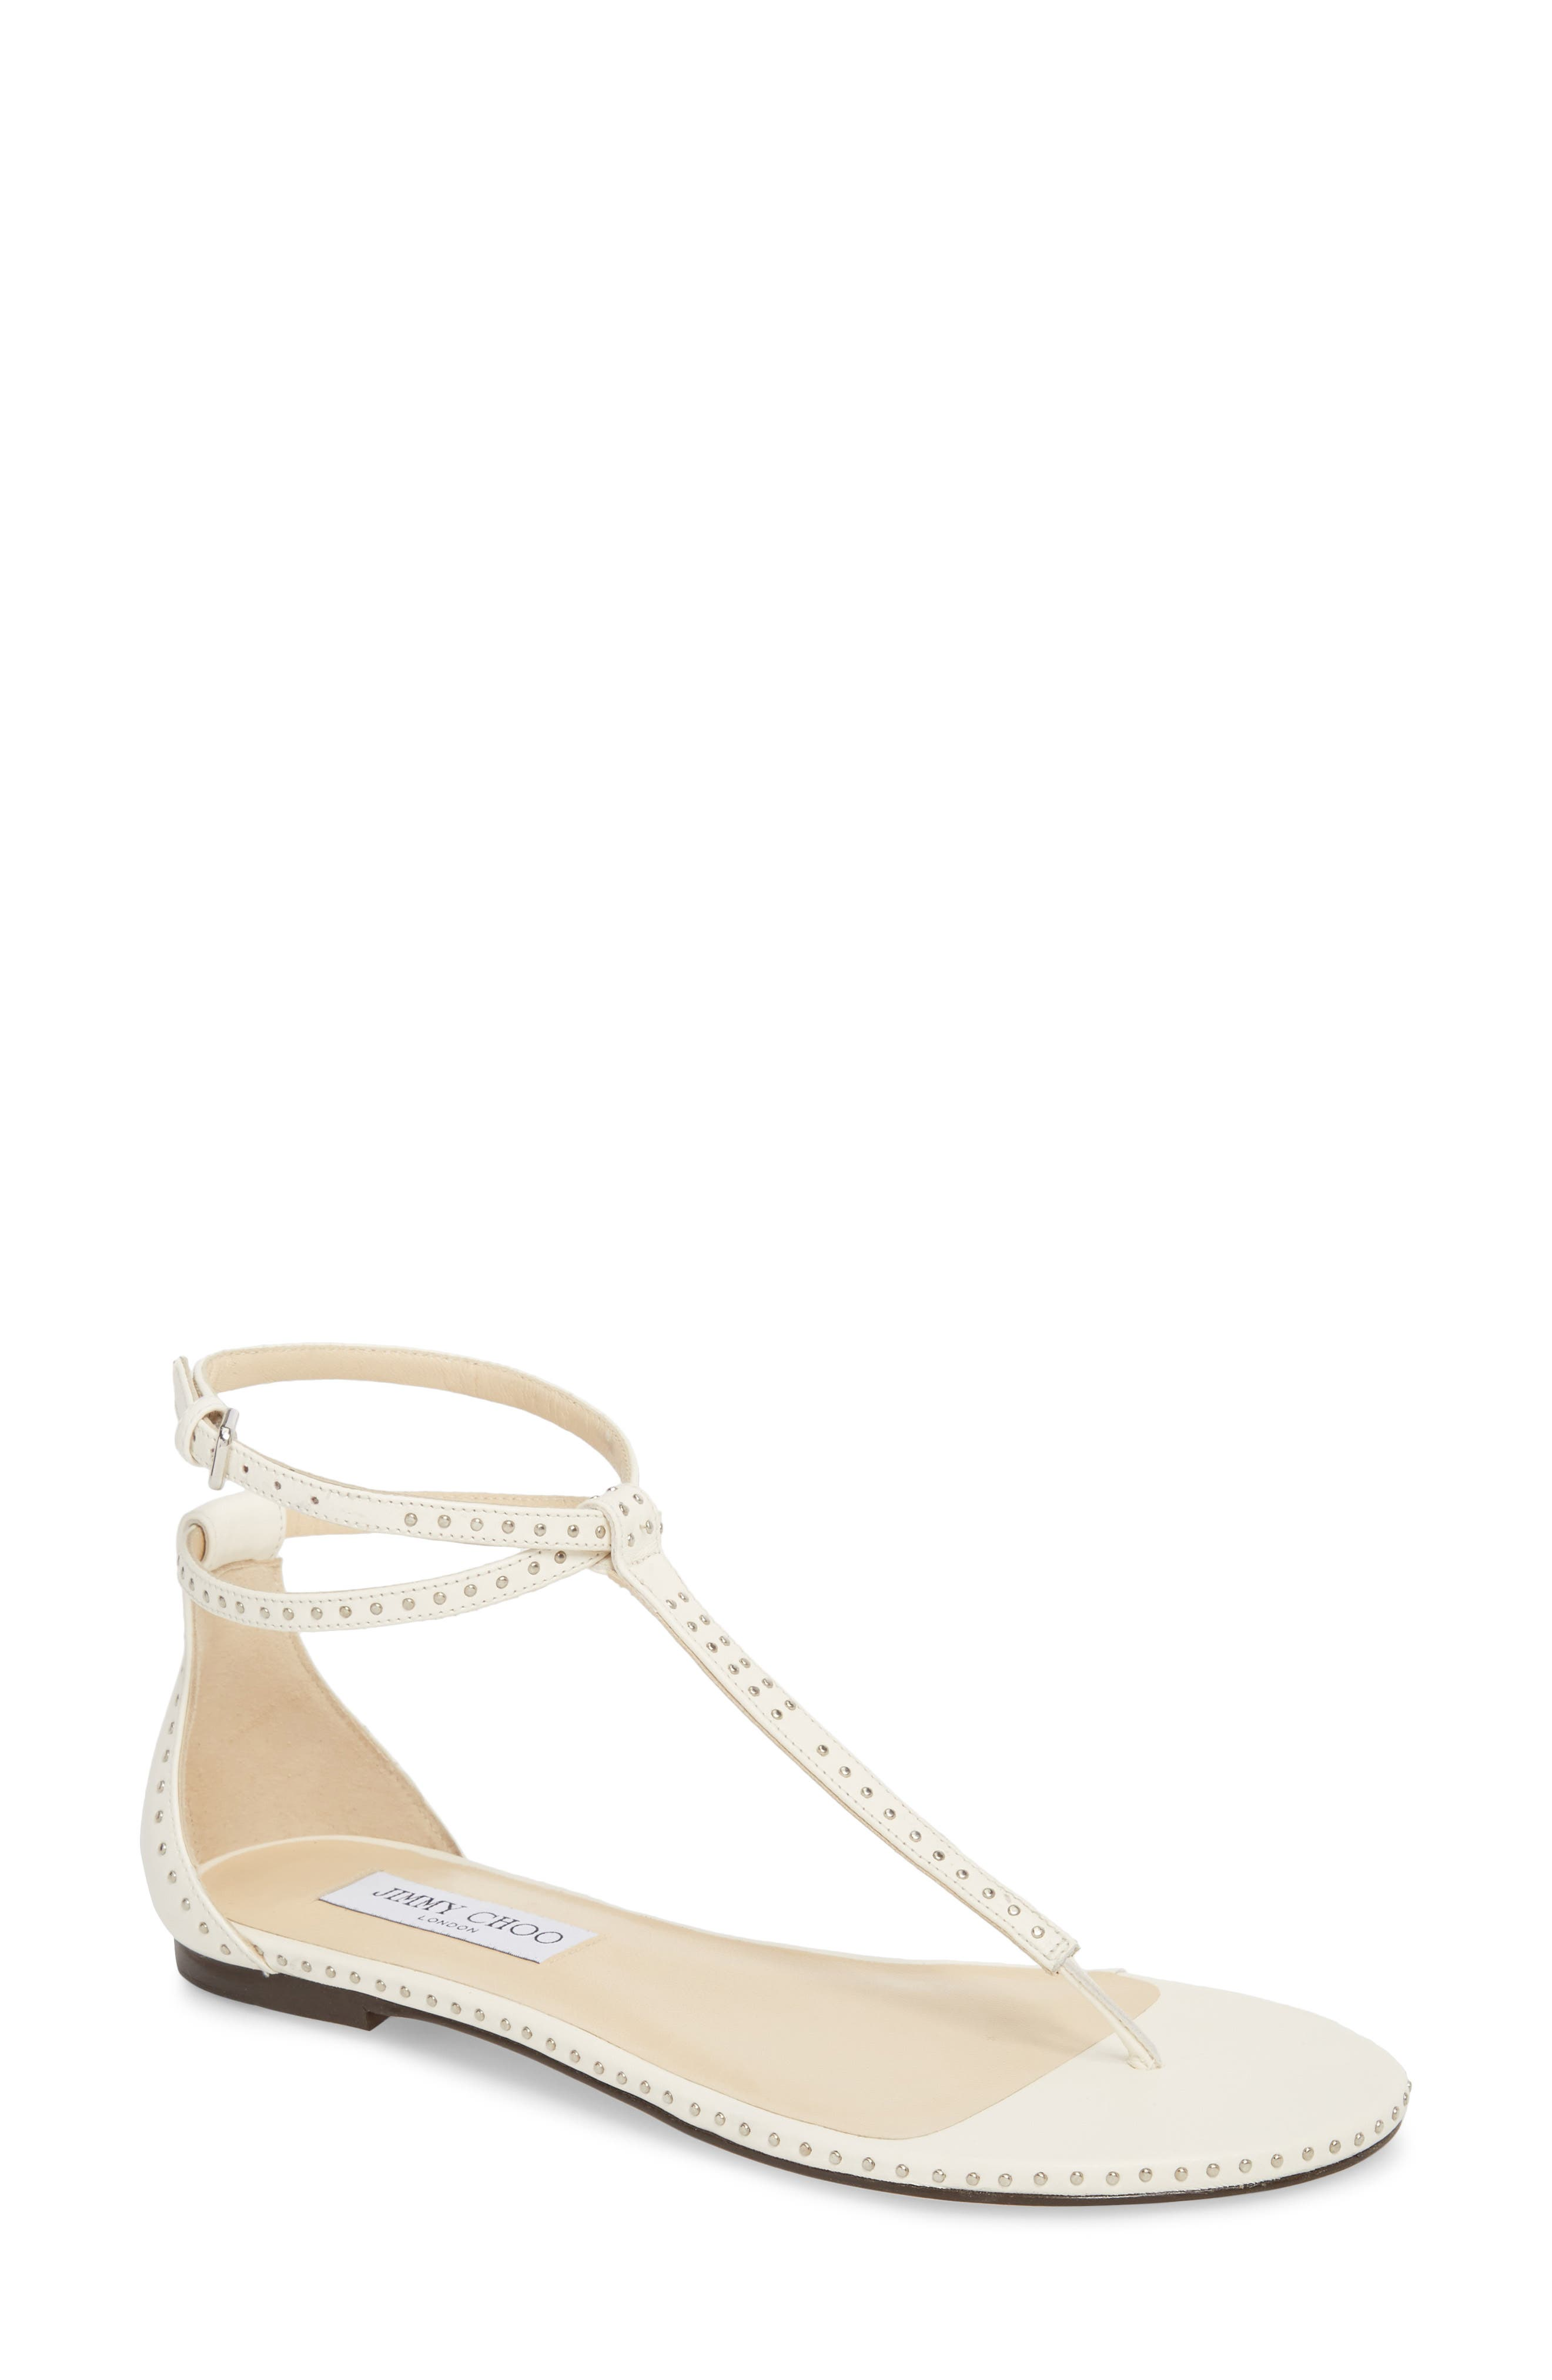 Afia Studded Leather Sandals - White Jimmy Choo London IKzc7VxH